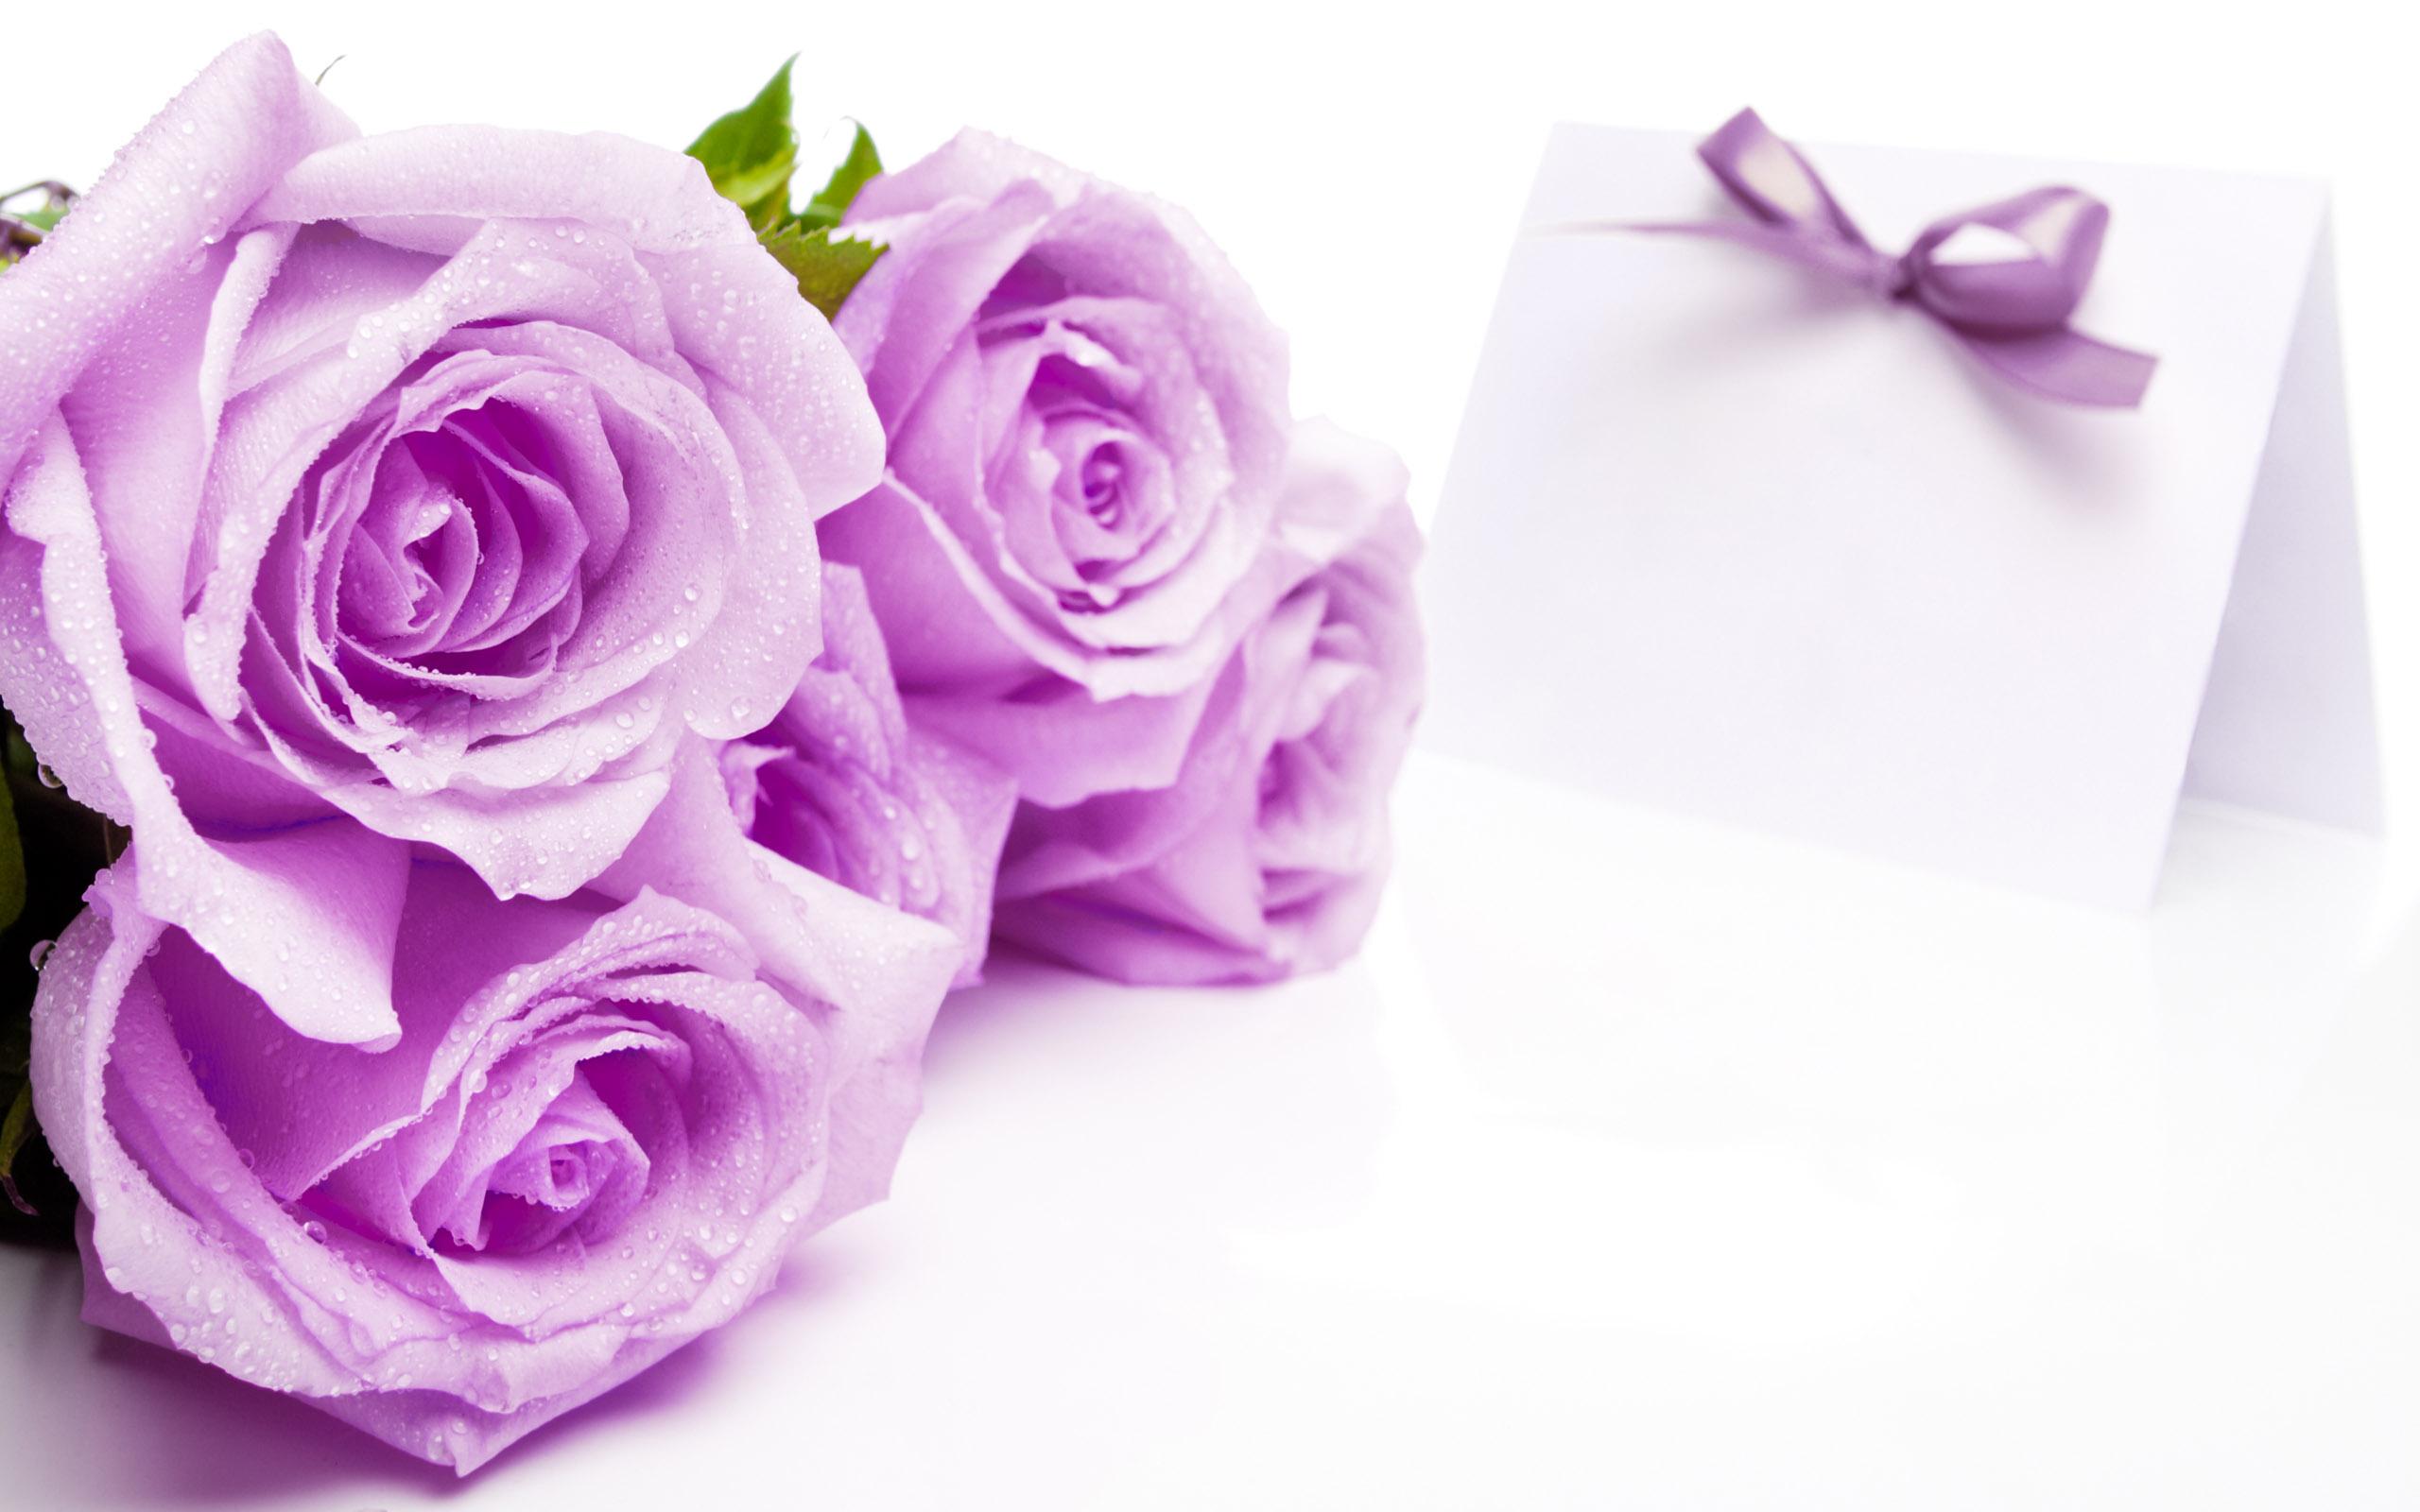 Free Download Rose Wallpaper Photos Beautiful Rose Flower Wallpaper 2560x1600 For Your Desktop Mobile Tablet Explore 76 Rose Flower Wallpapers Rose Flowers Wallpapers Free Download Roses Wallpapers For Desktop